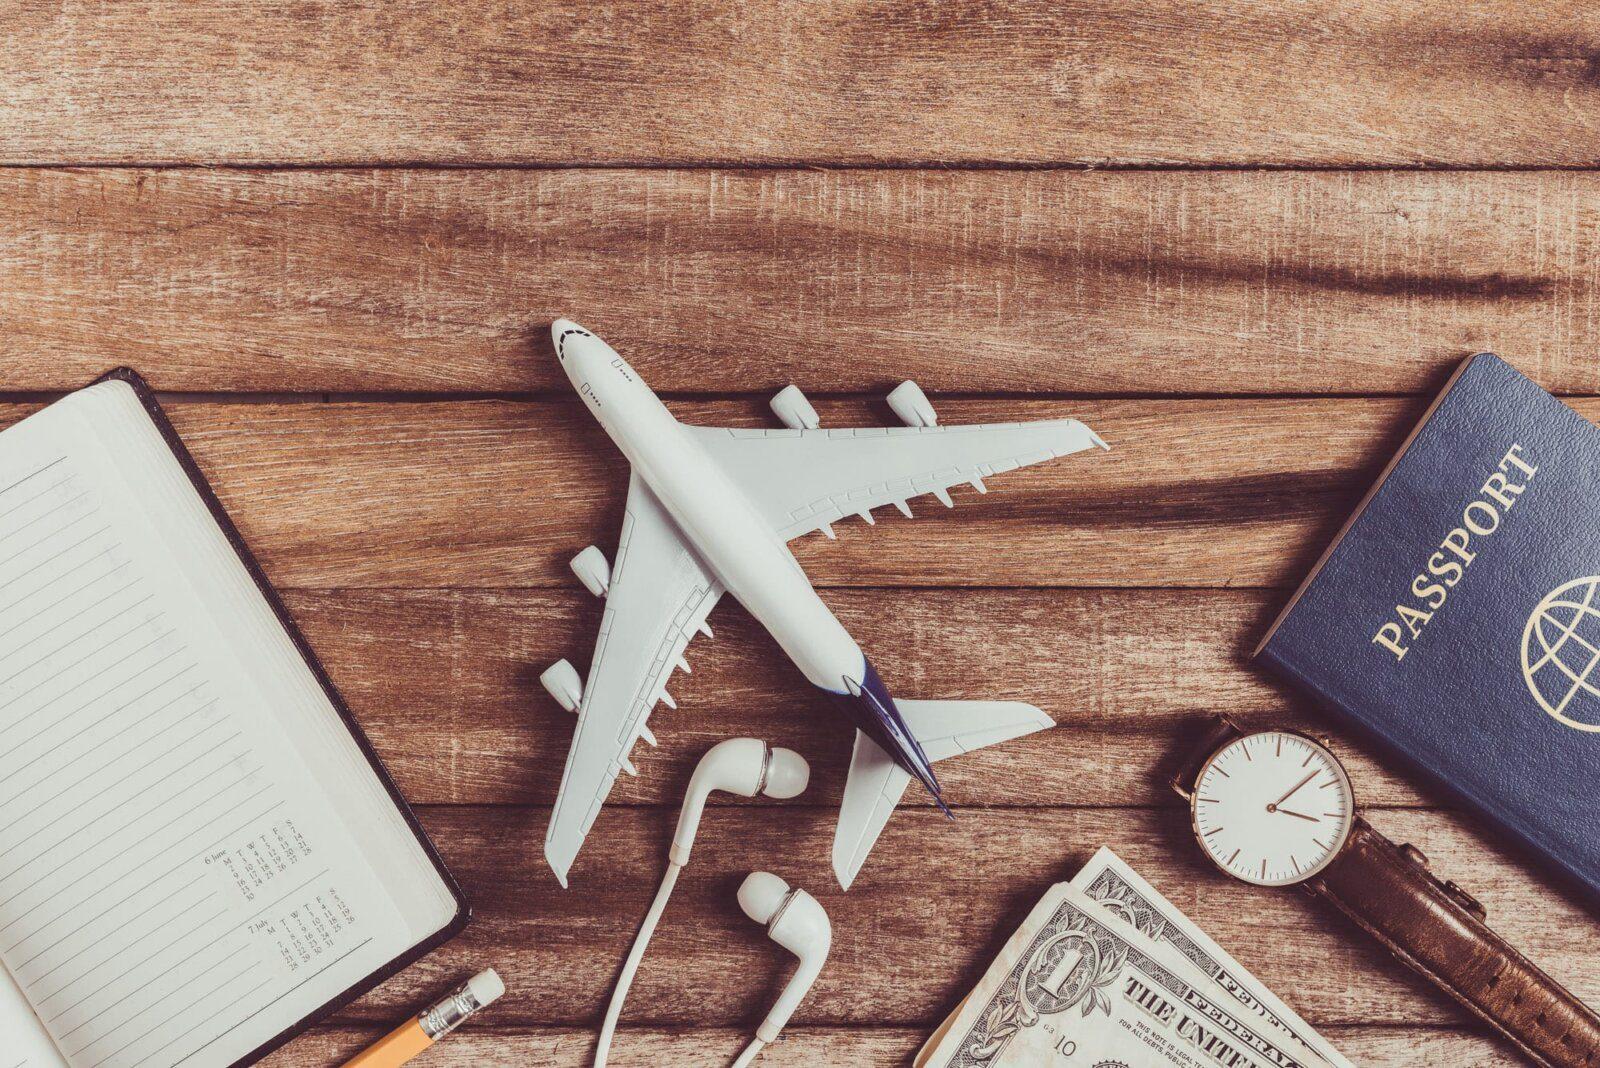 Plane, money and passport on table